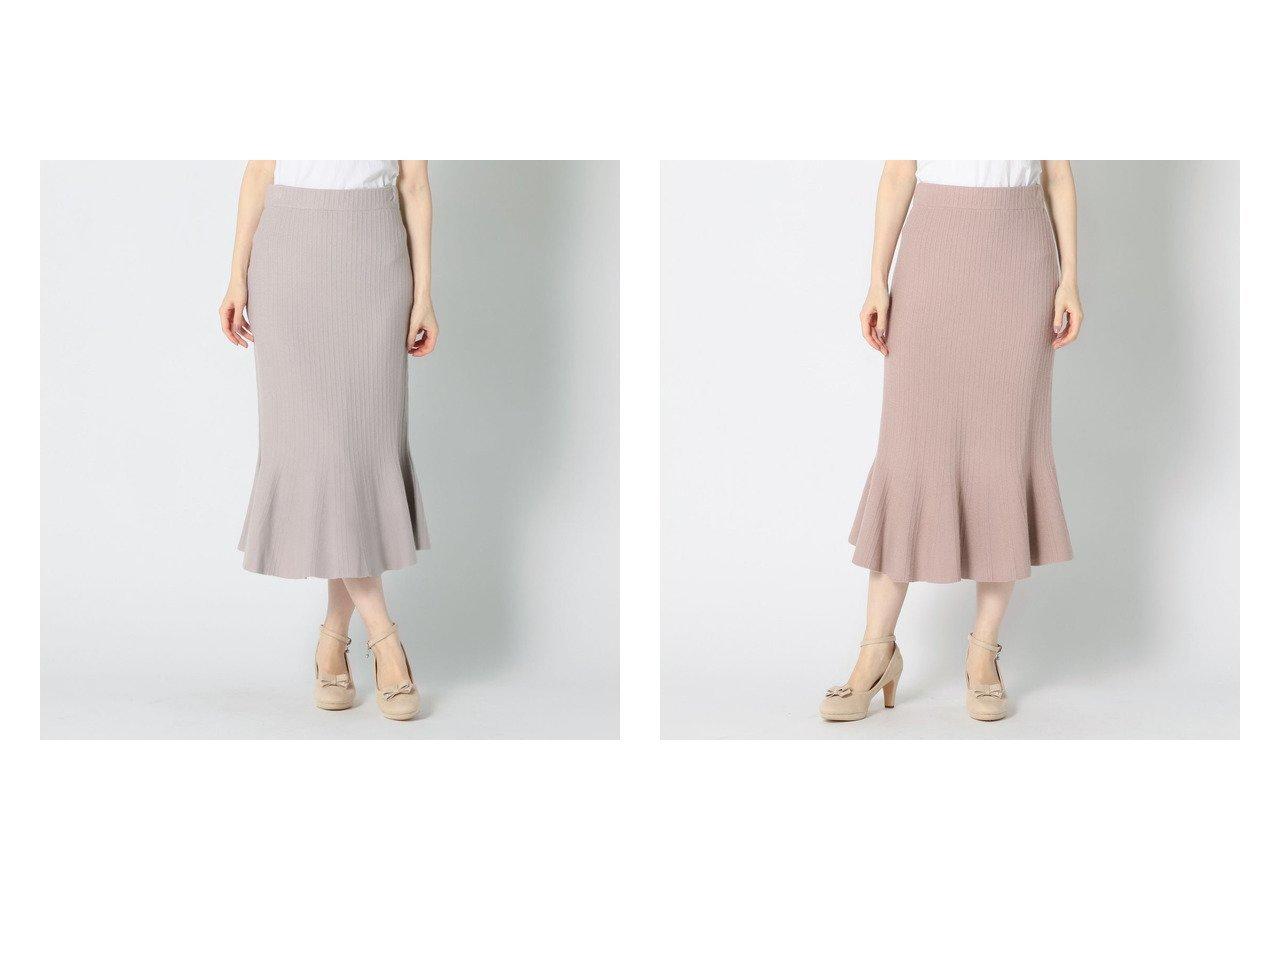 【MISCH MASCH/ミッシュマッシュ】の《田中みな実さん着用》マーメイドラインニットスカート おすすめ!人気、トレンド・レディースファッションの通販  おすすめで人気の流行・トレンド、ファッションの通販商品 メンズファッション・キッズファッション・インテリア・家具・レディースファッション・服の通販 founy(ファニー) https://founy.com/ ファッションモデル・俳優・女優 Models 女性 Women 田中みな実 Tanaka Minami ファッション Fashion レディースファッション WOMEN スカート Skirt 2020年 2020 2020-2021 秋冬 A/W AW Autumn/Winter / FW Fall-Winter 2020-2021 A/W 秋冬 AW Autumn/Winter / FW Fall-Winter シンプル マーメイド |ID:crp329100000014282